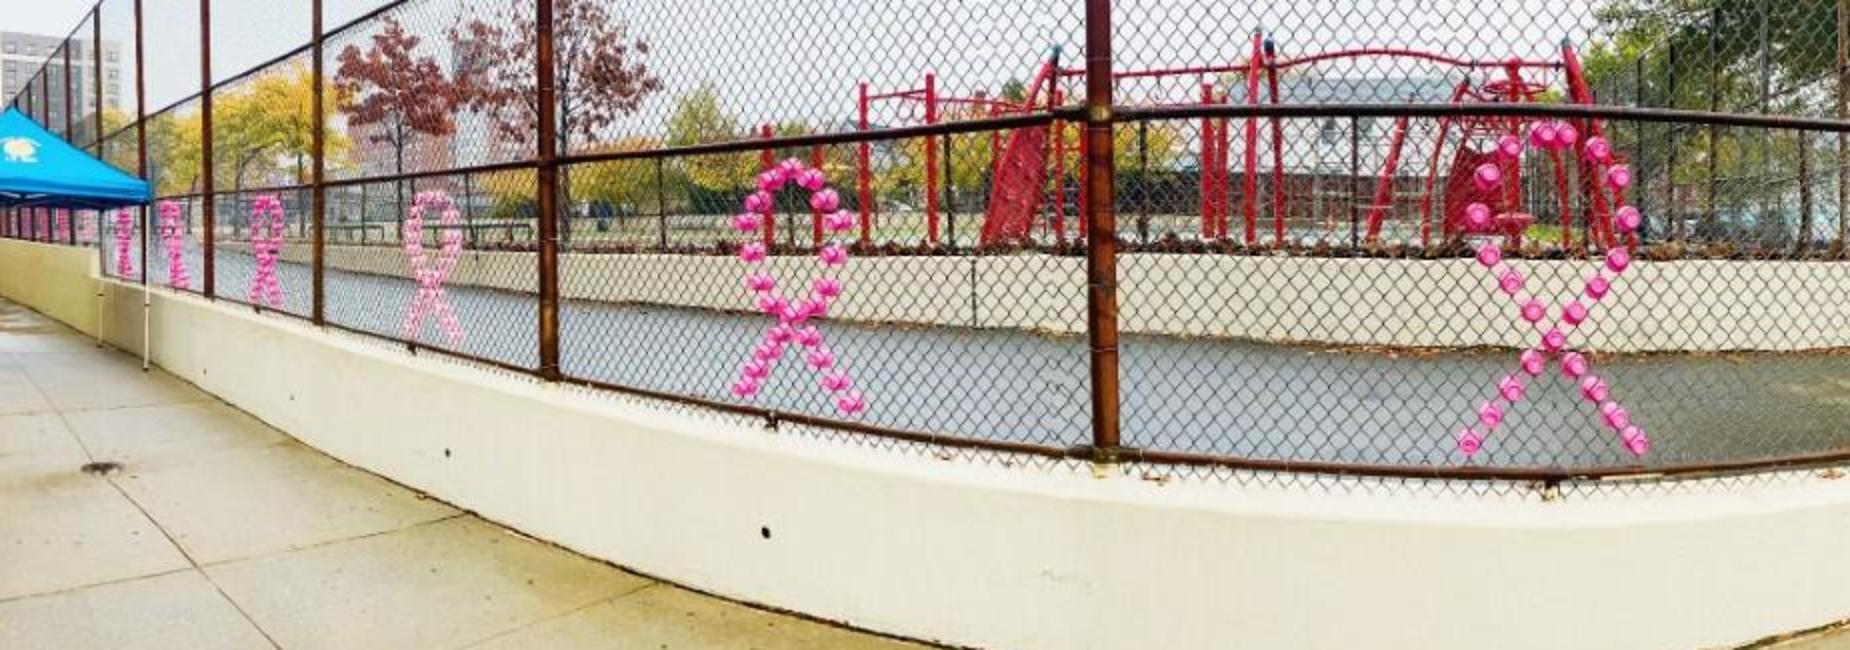 Breast Cancer Awareness Week 2020